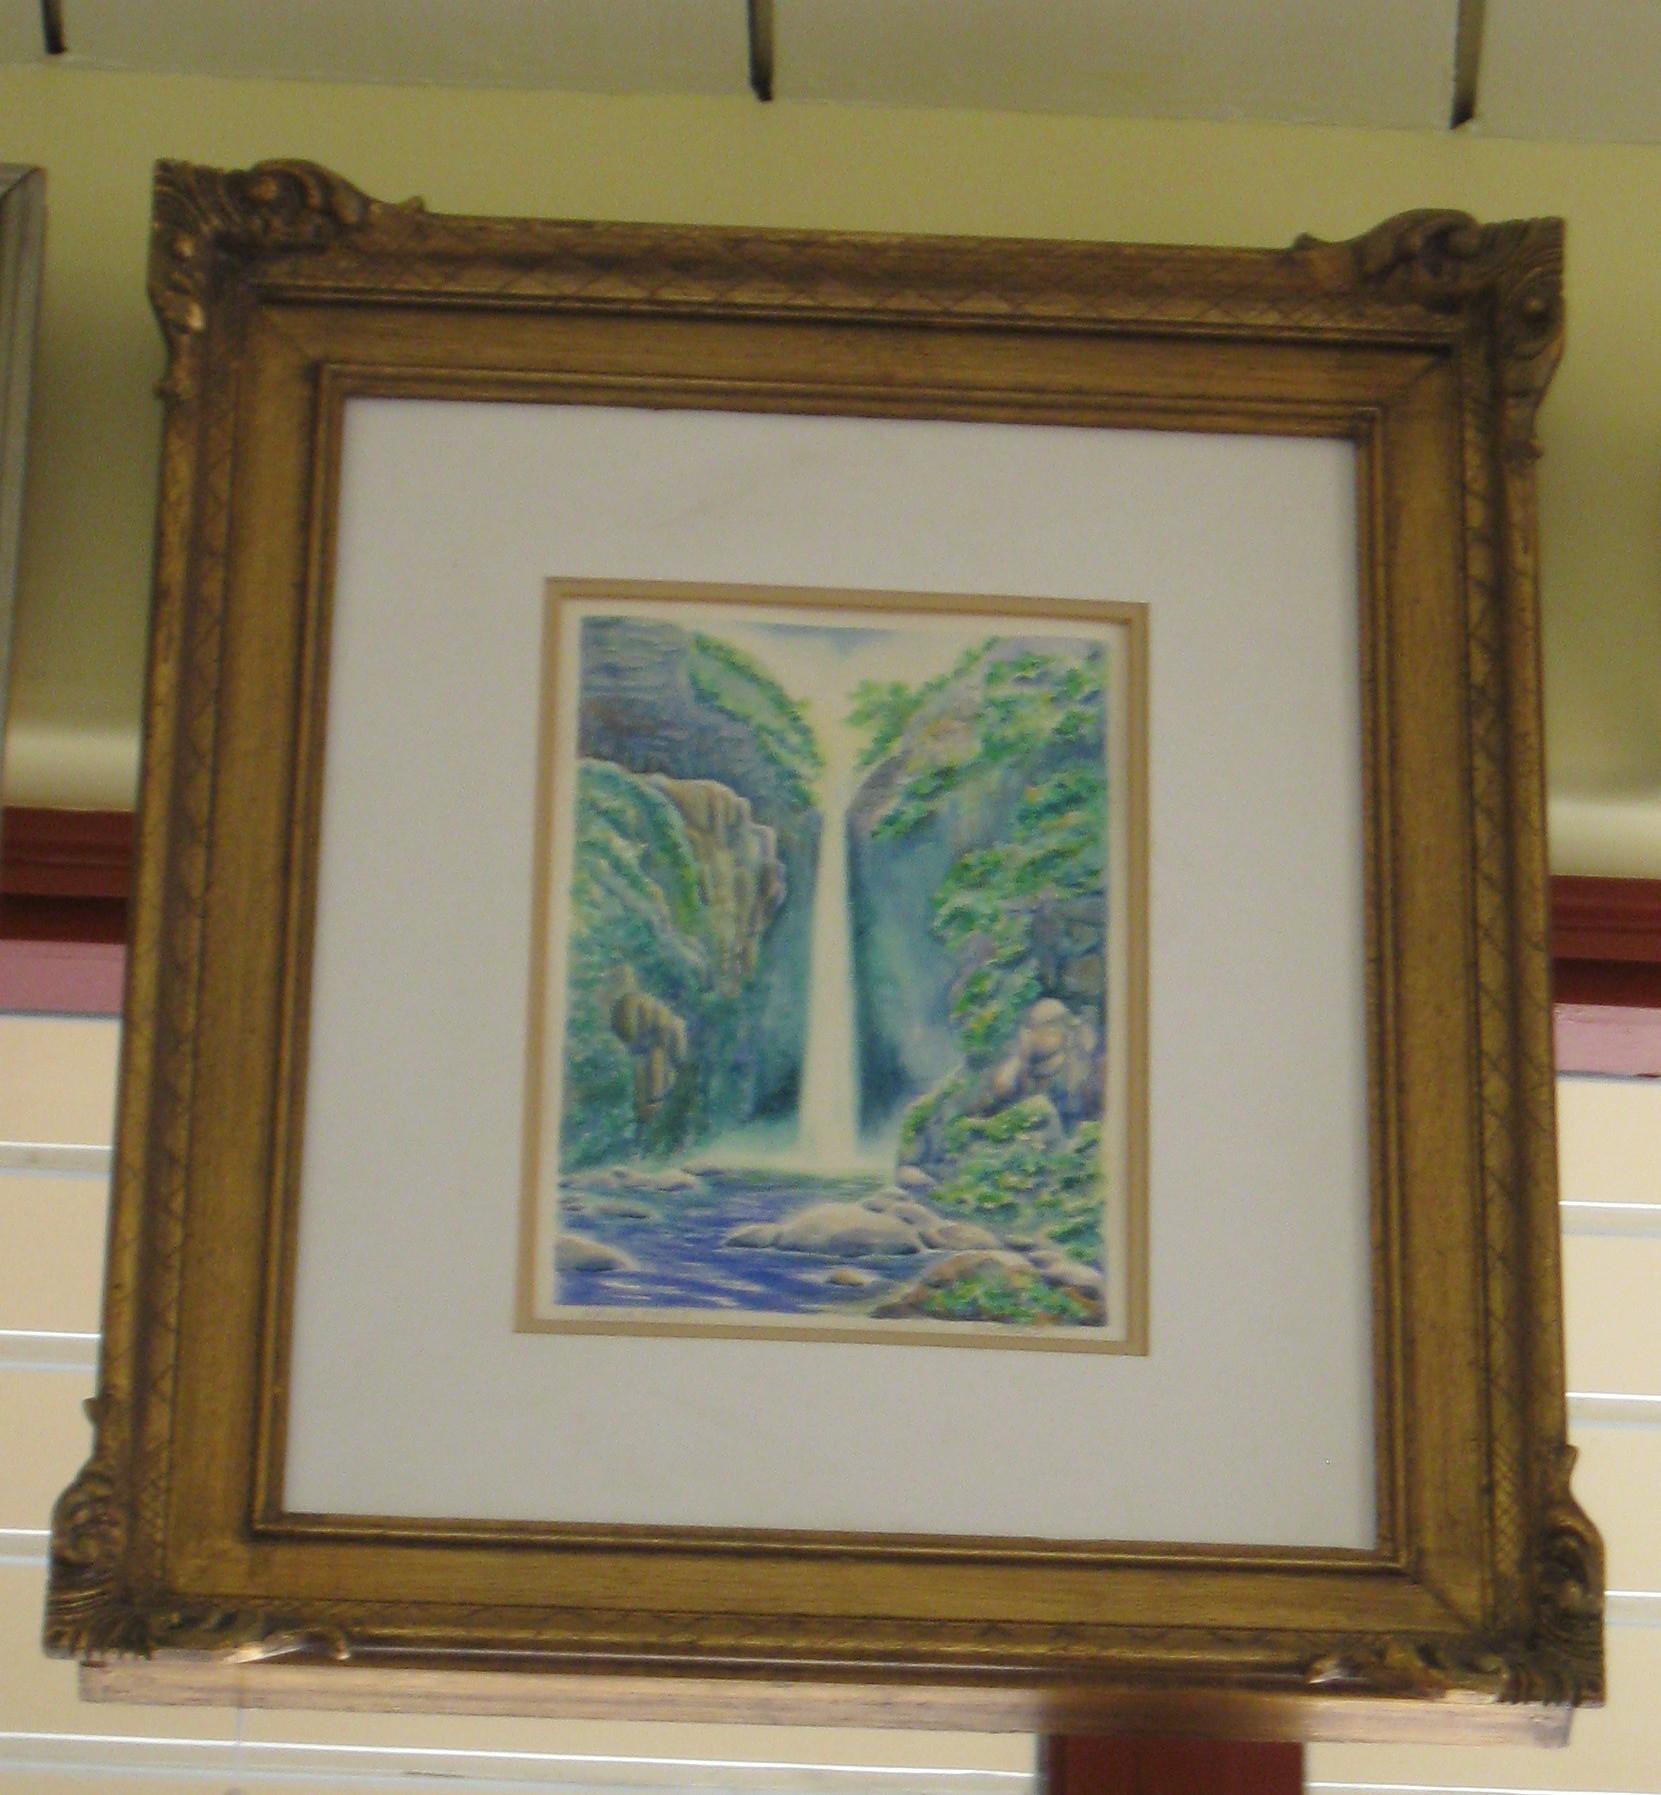 Wailua Falls in Lihue, Kauai Framed Watercolor Painting - **Store Pick Up**